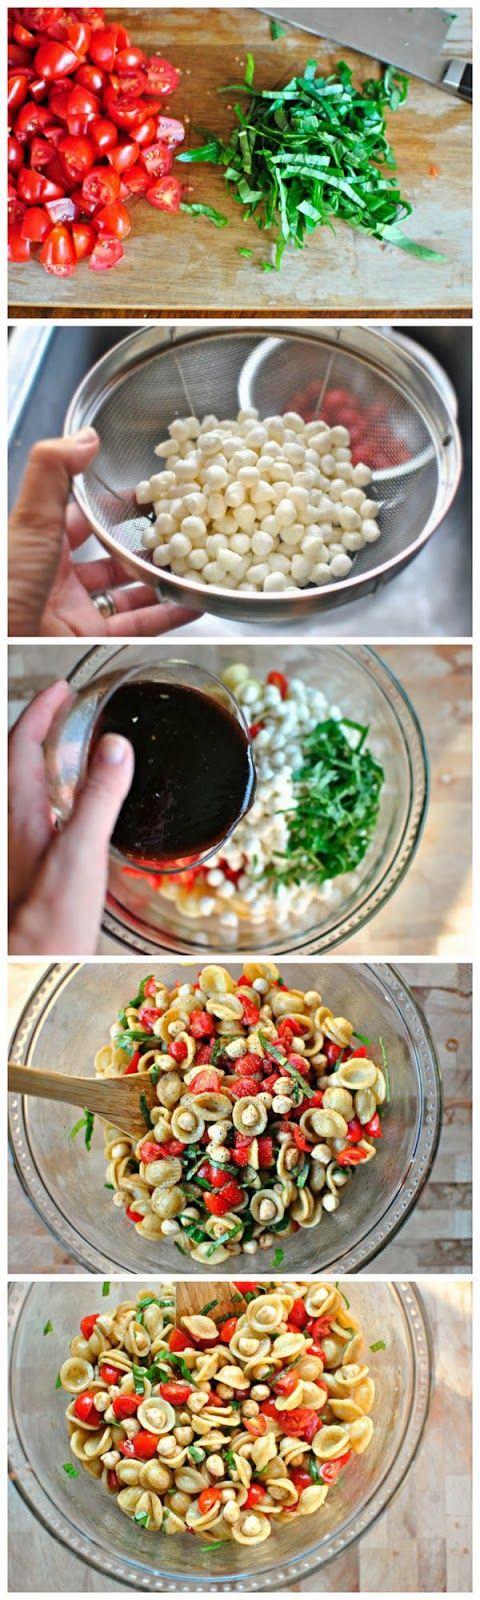 Caprese Pasta Salad - Recipe Favorite @sarahthoomas